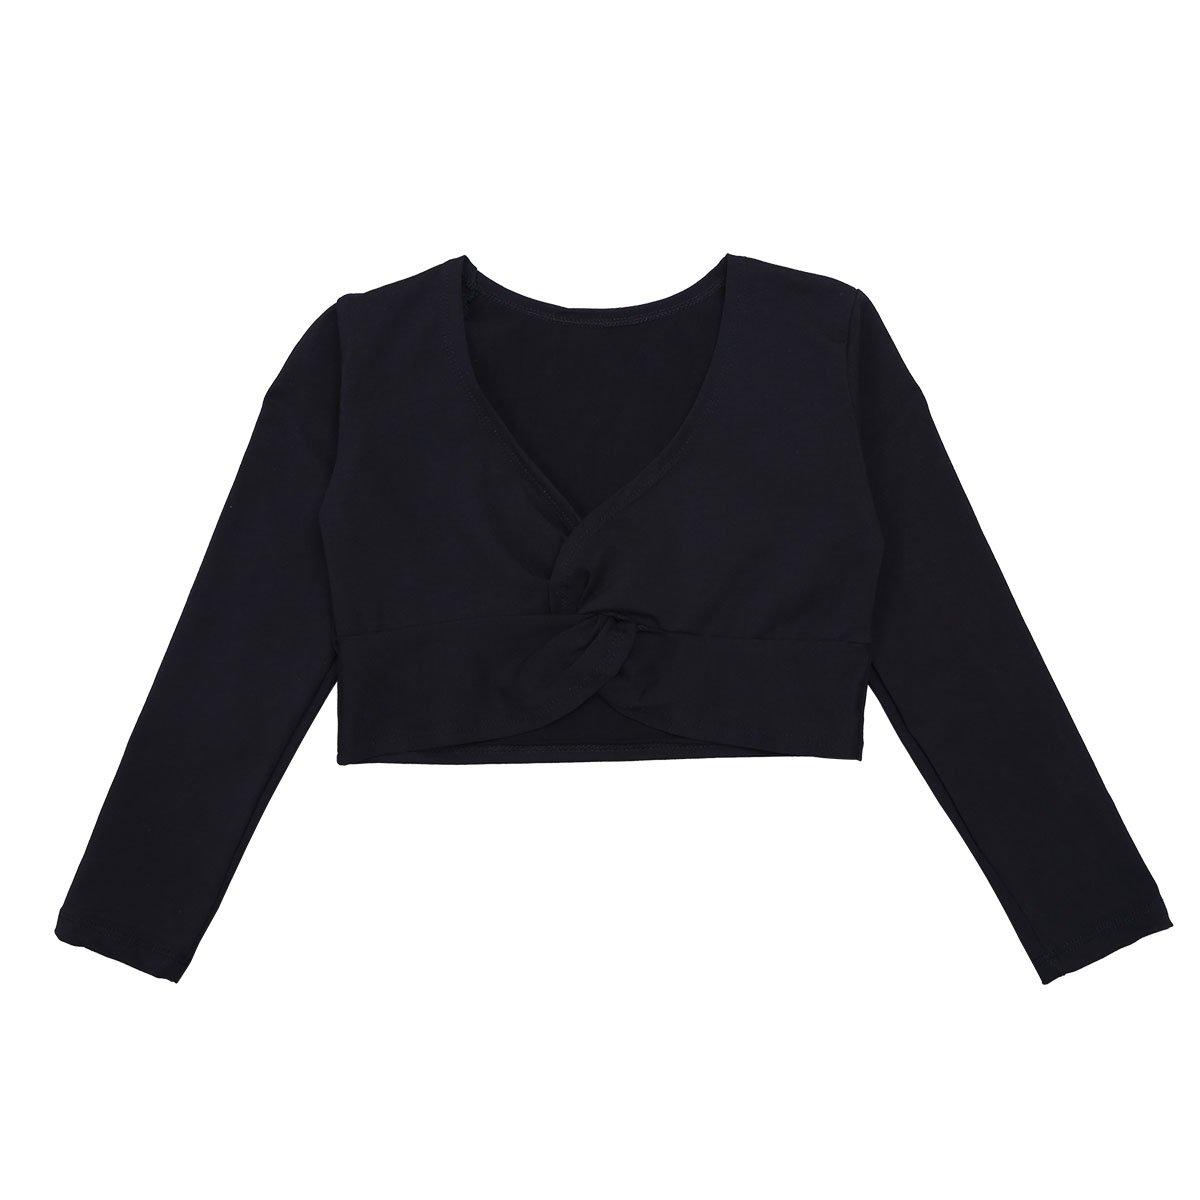 iEFiEL Girls Front Twist Knot Long Sleeve Ballerina Dance Cotton Wrap Top Black 5-6